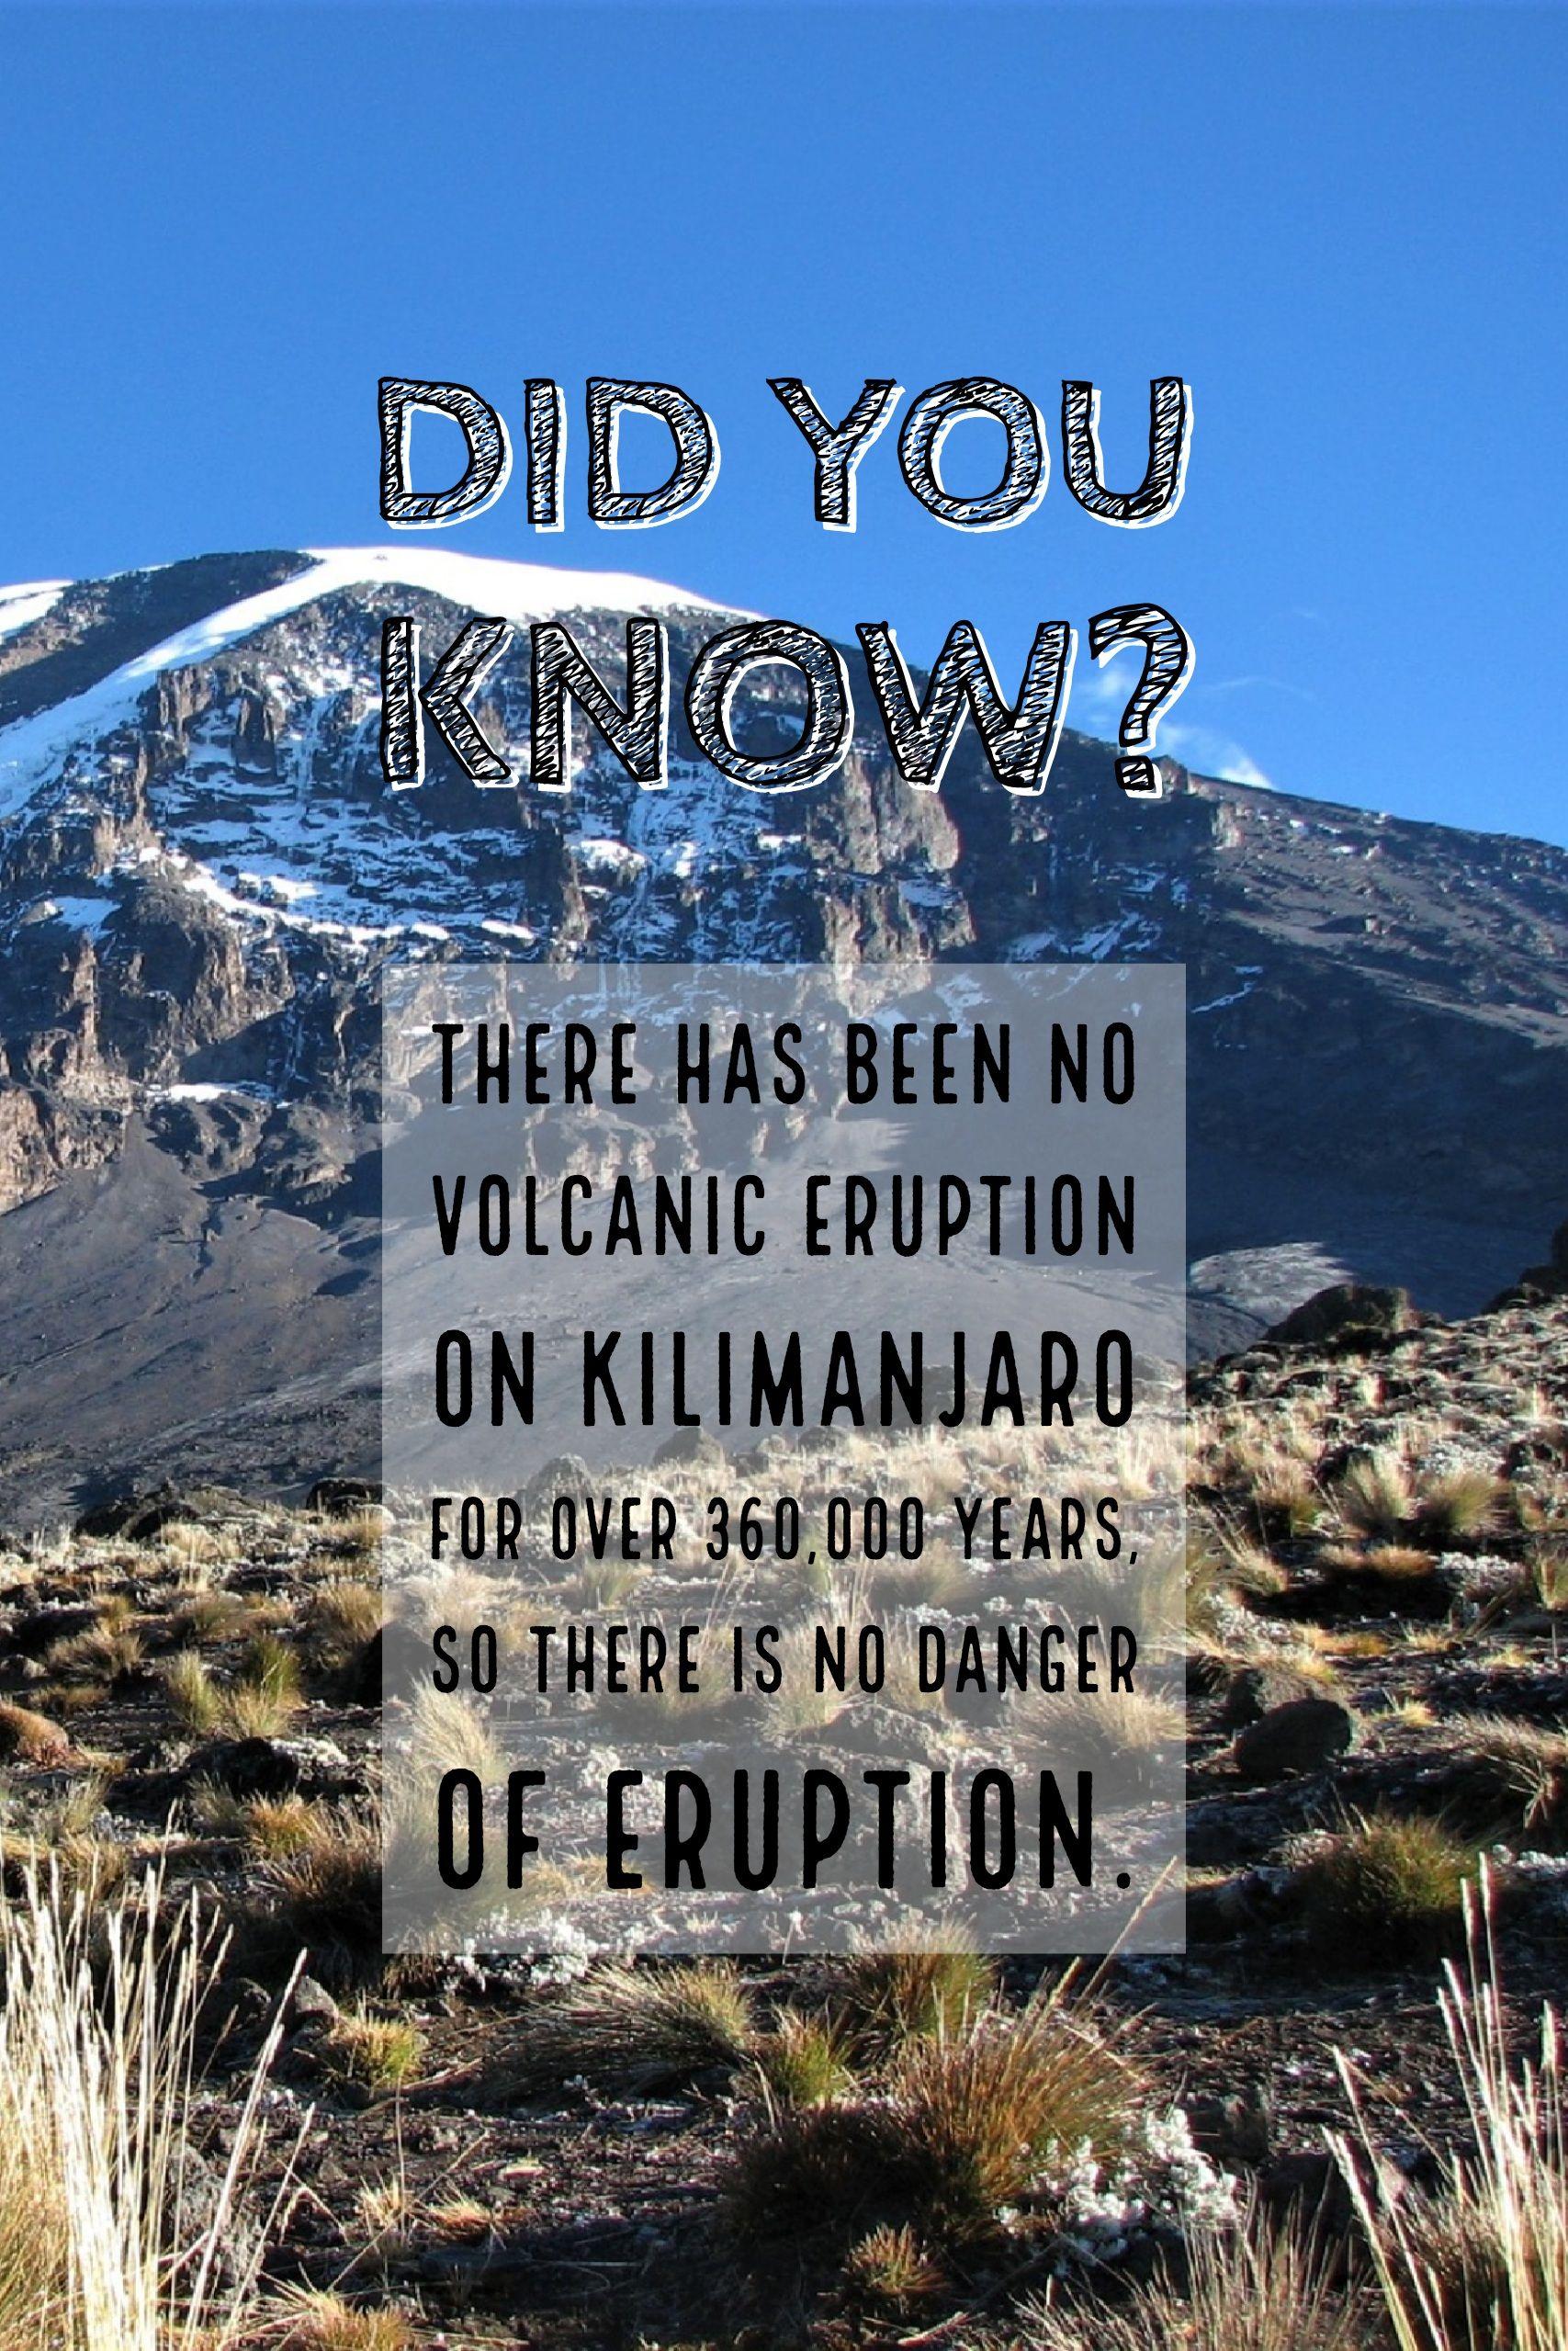 Hike Mount Kilimanjaro In Tanzania Kilimanjaro Hiking Tours